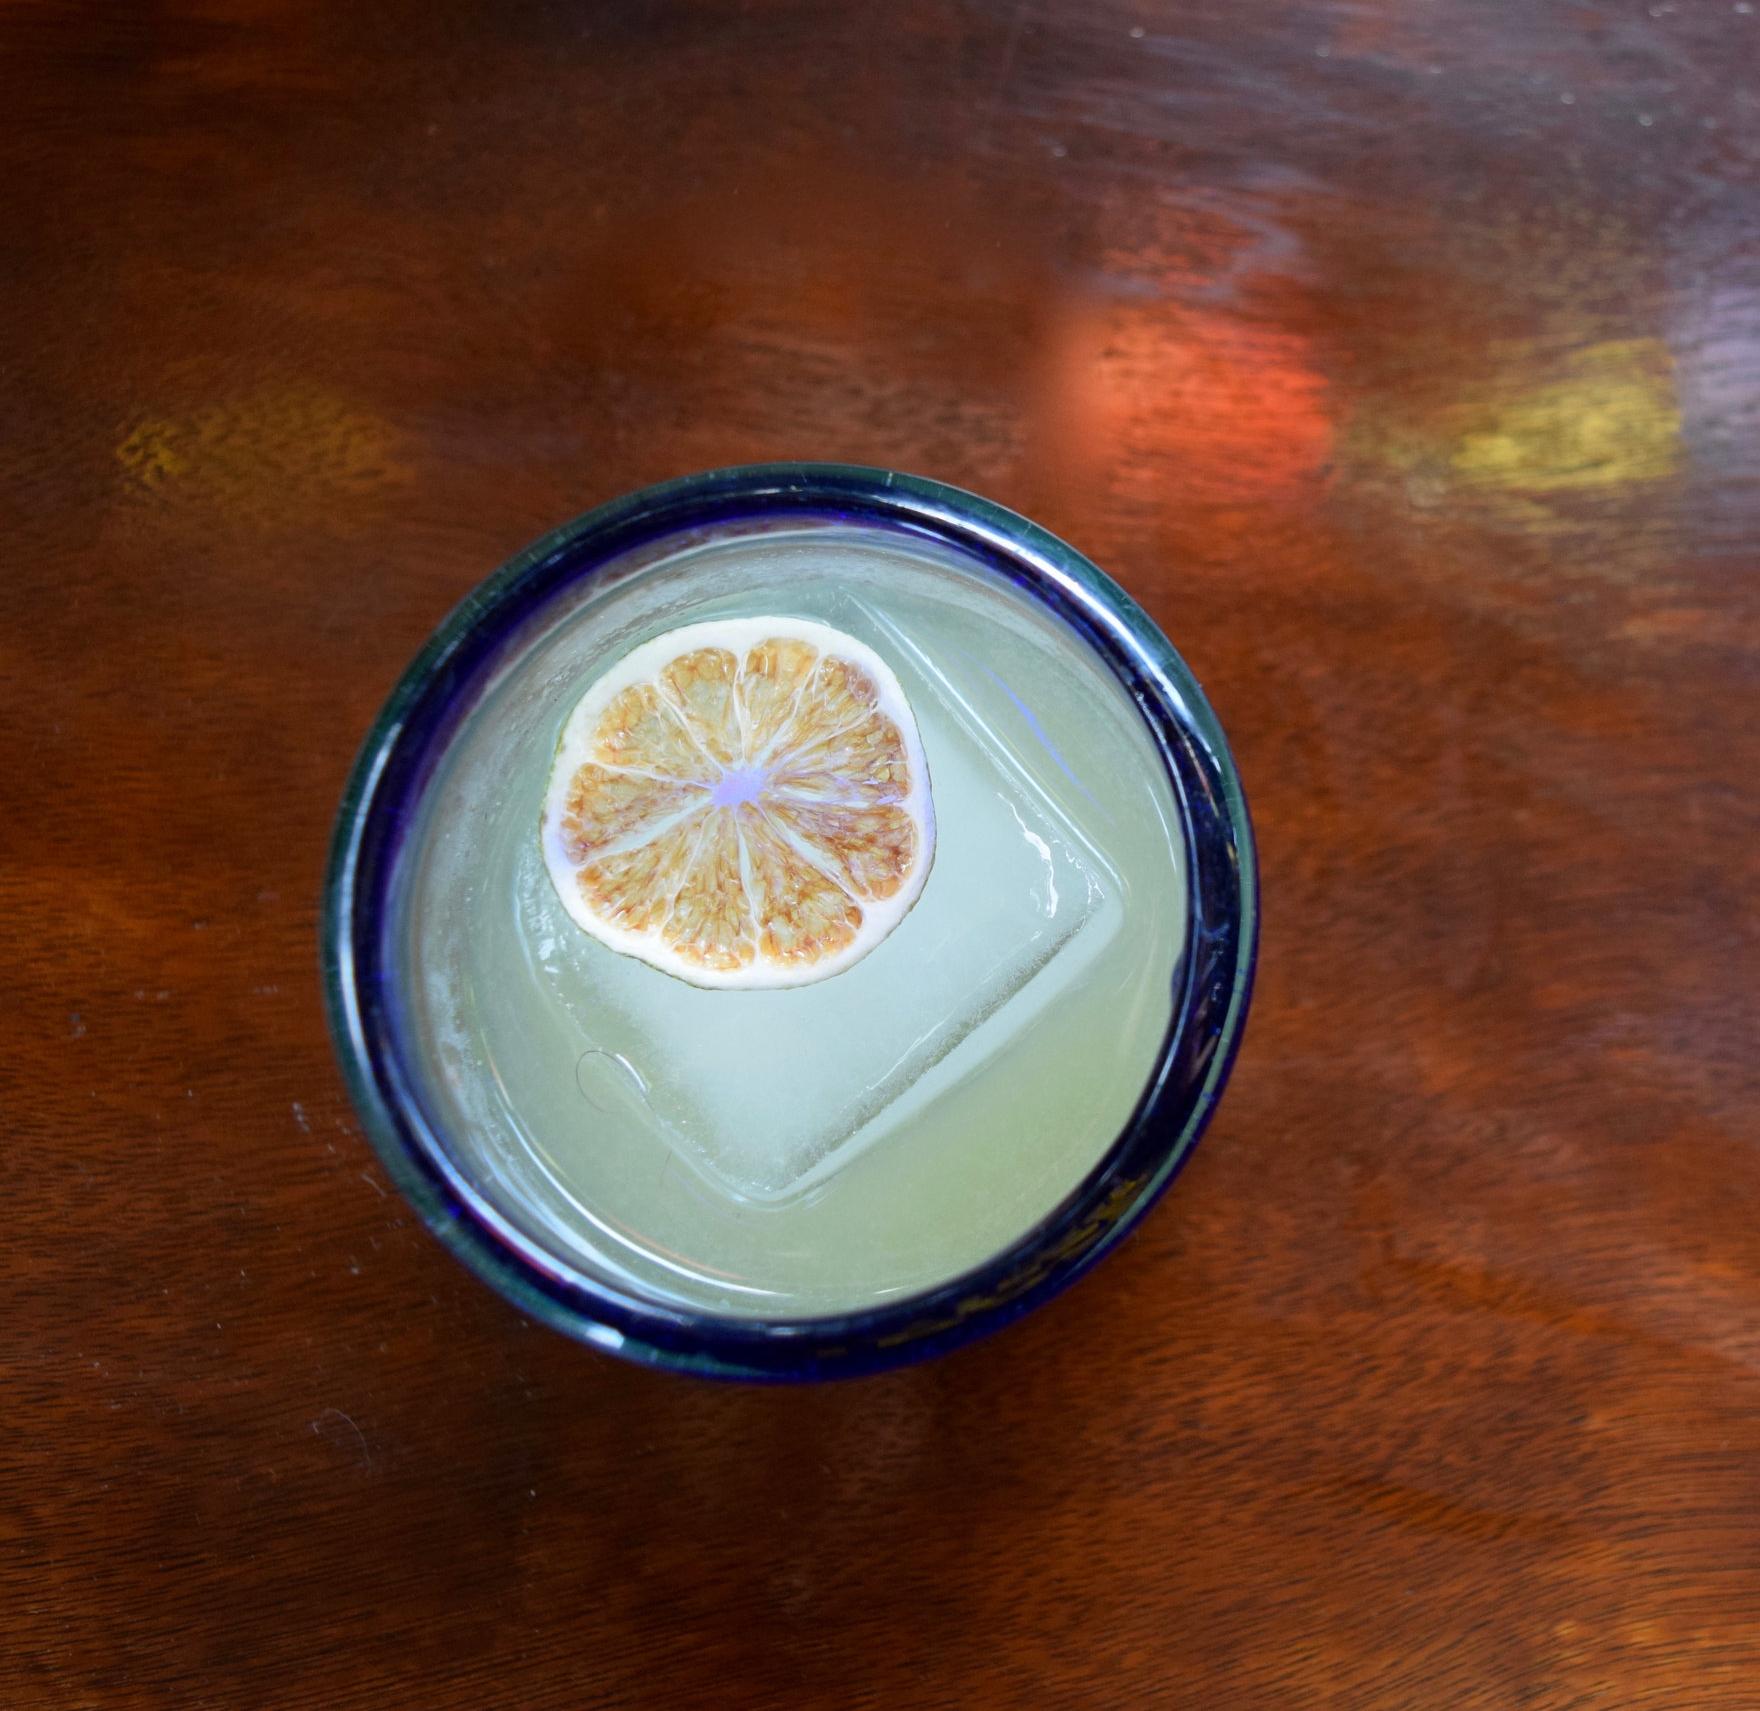 FLOWER WAR - 1 oz gin1 oz ancho reyes verde liqueur1/2 oz nostrum kumquat lemongrass lime leaf shrub1 oz lime juiceShake with ice and strain.